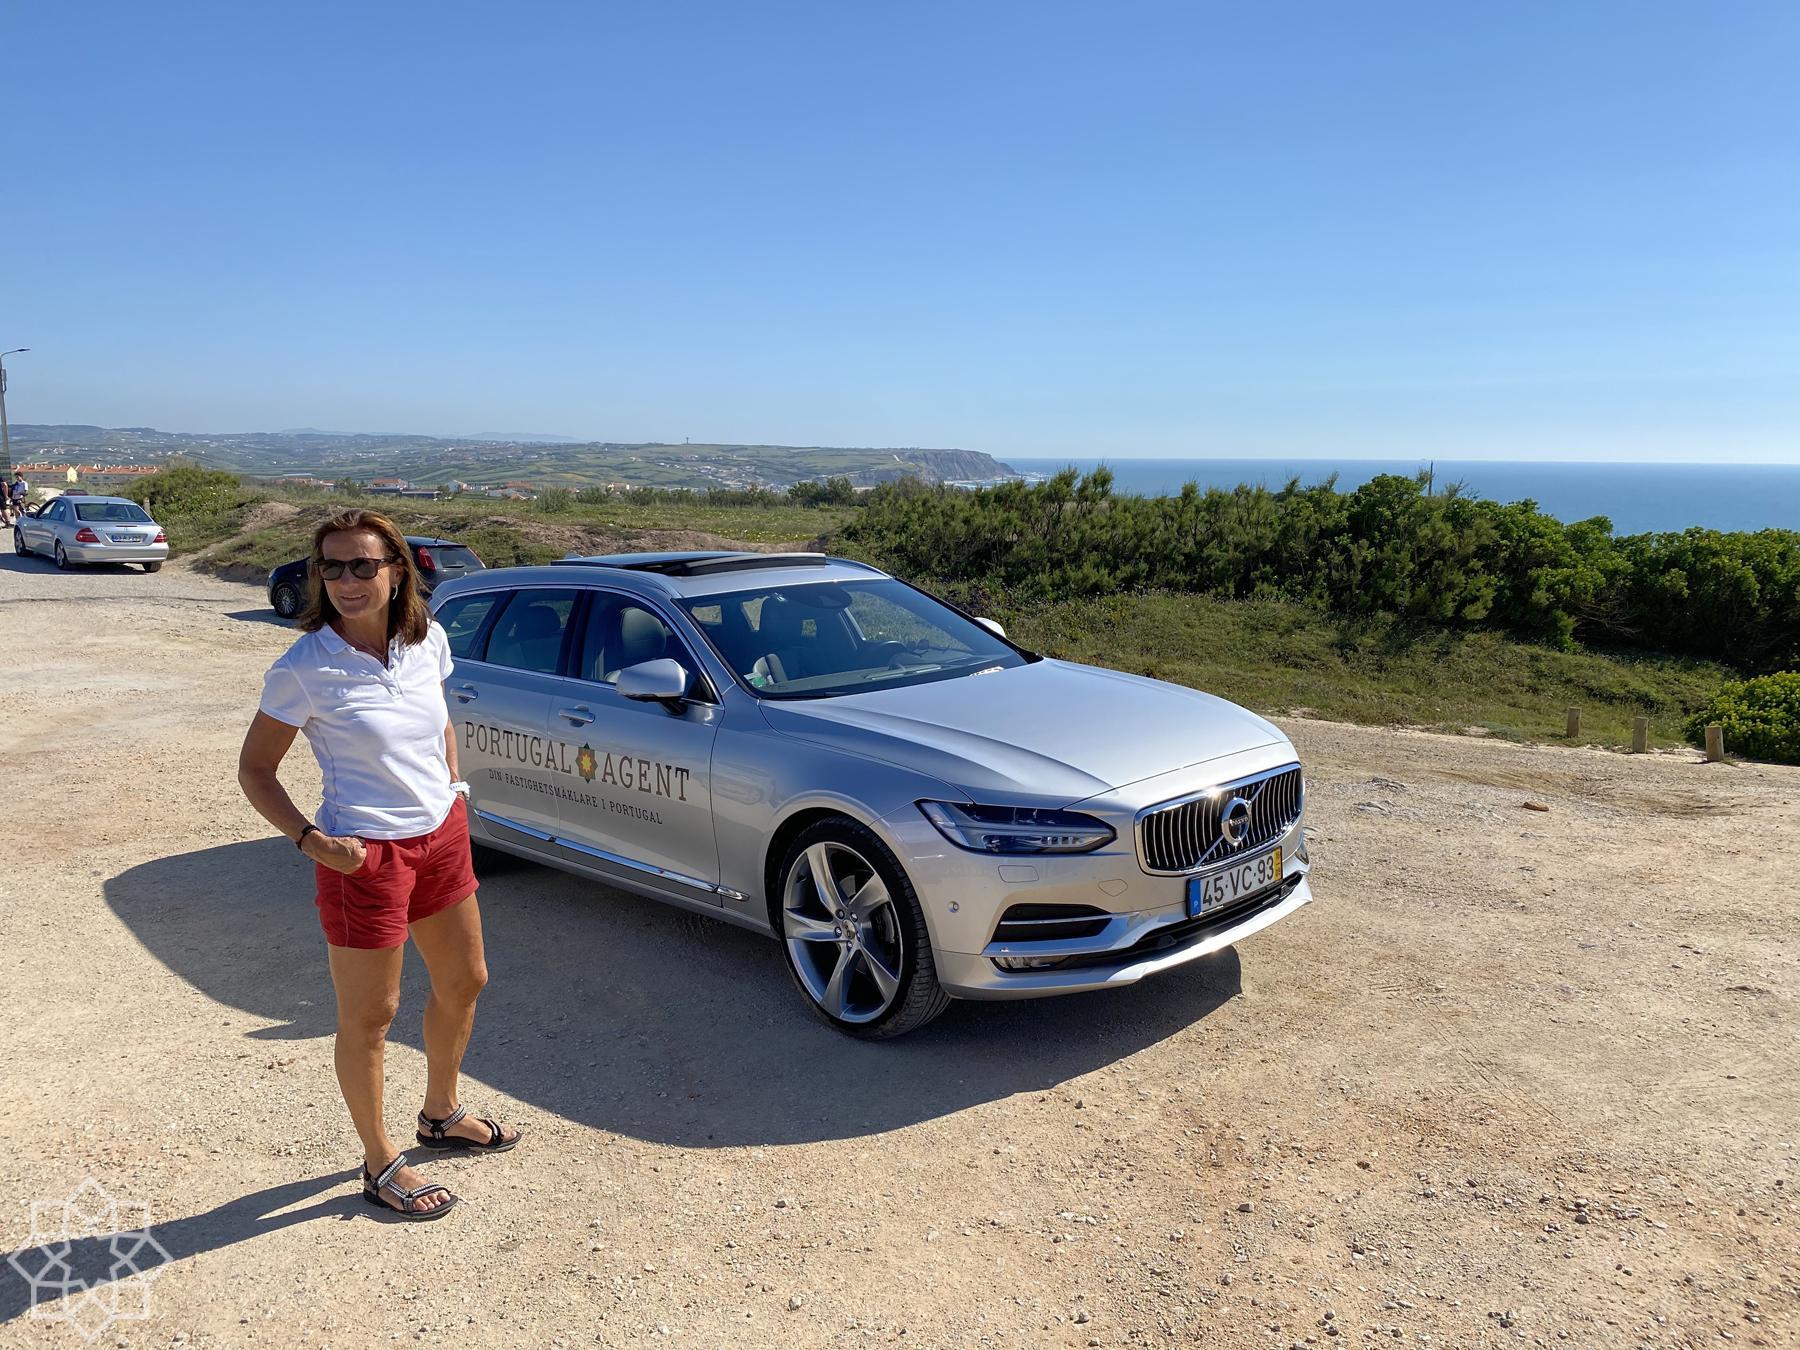 Portugal Agent på Praia Azul